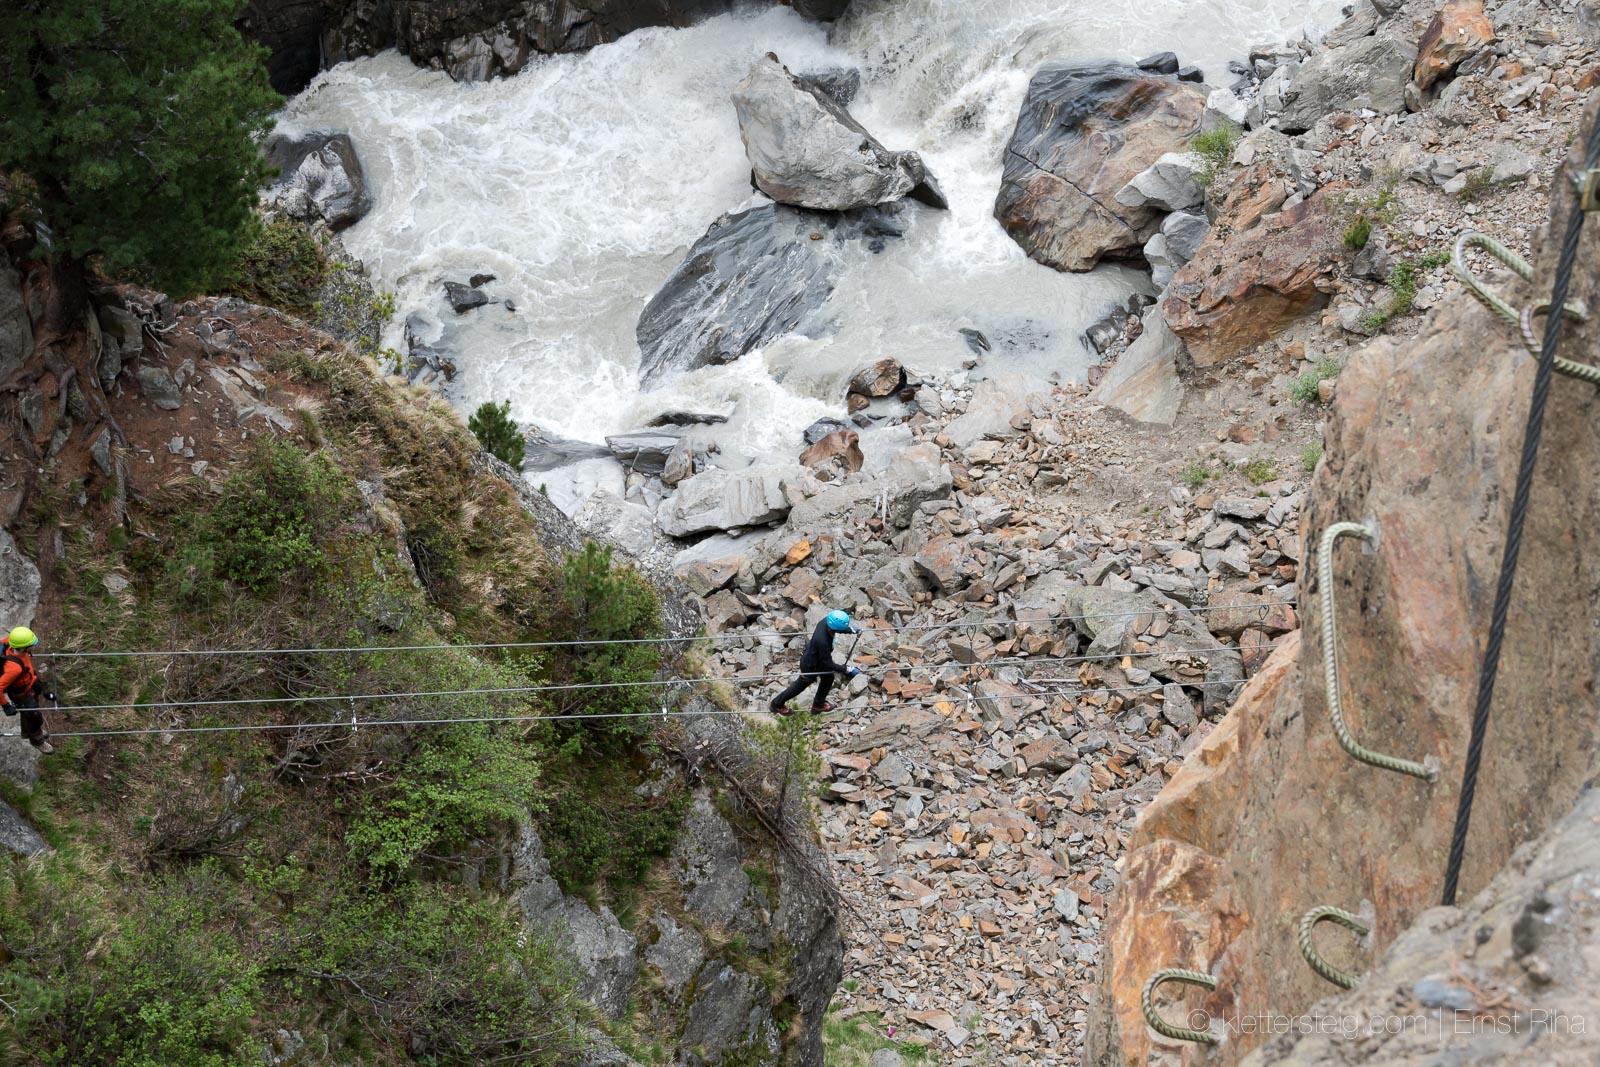 Klettersteig Obergurgl : Juni zirmwald klettersteig obergurgl klettersteige